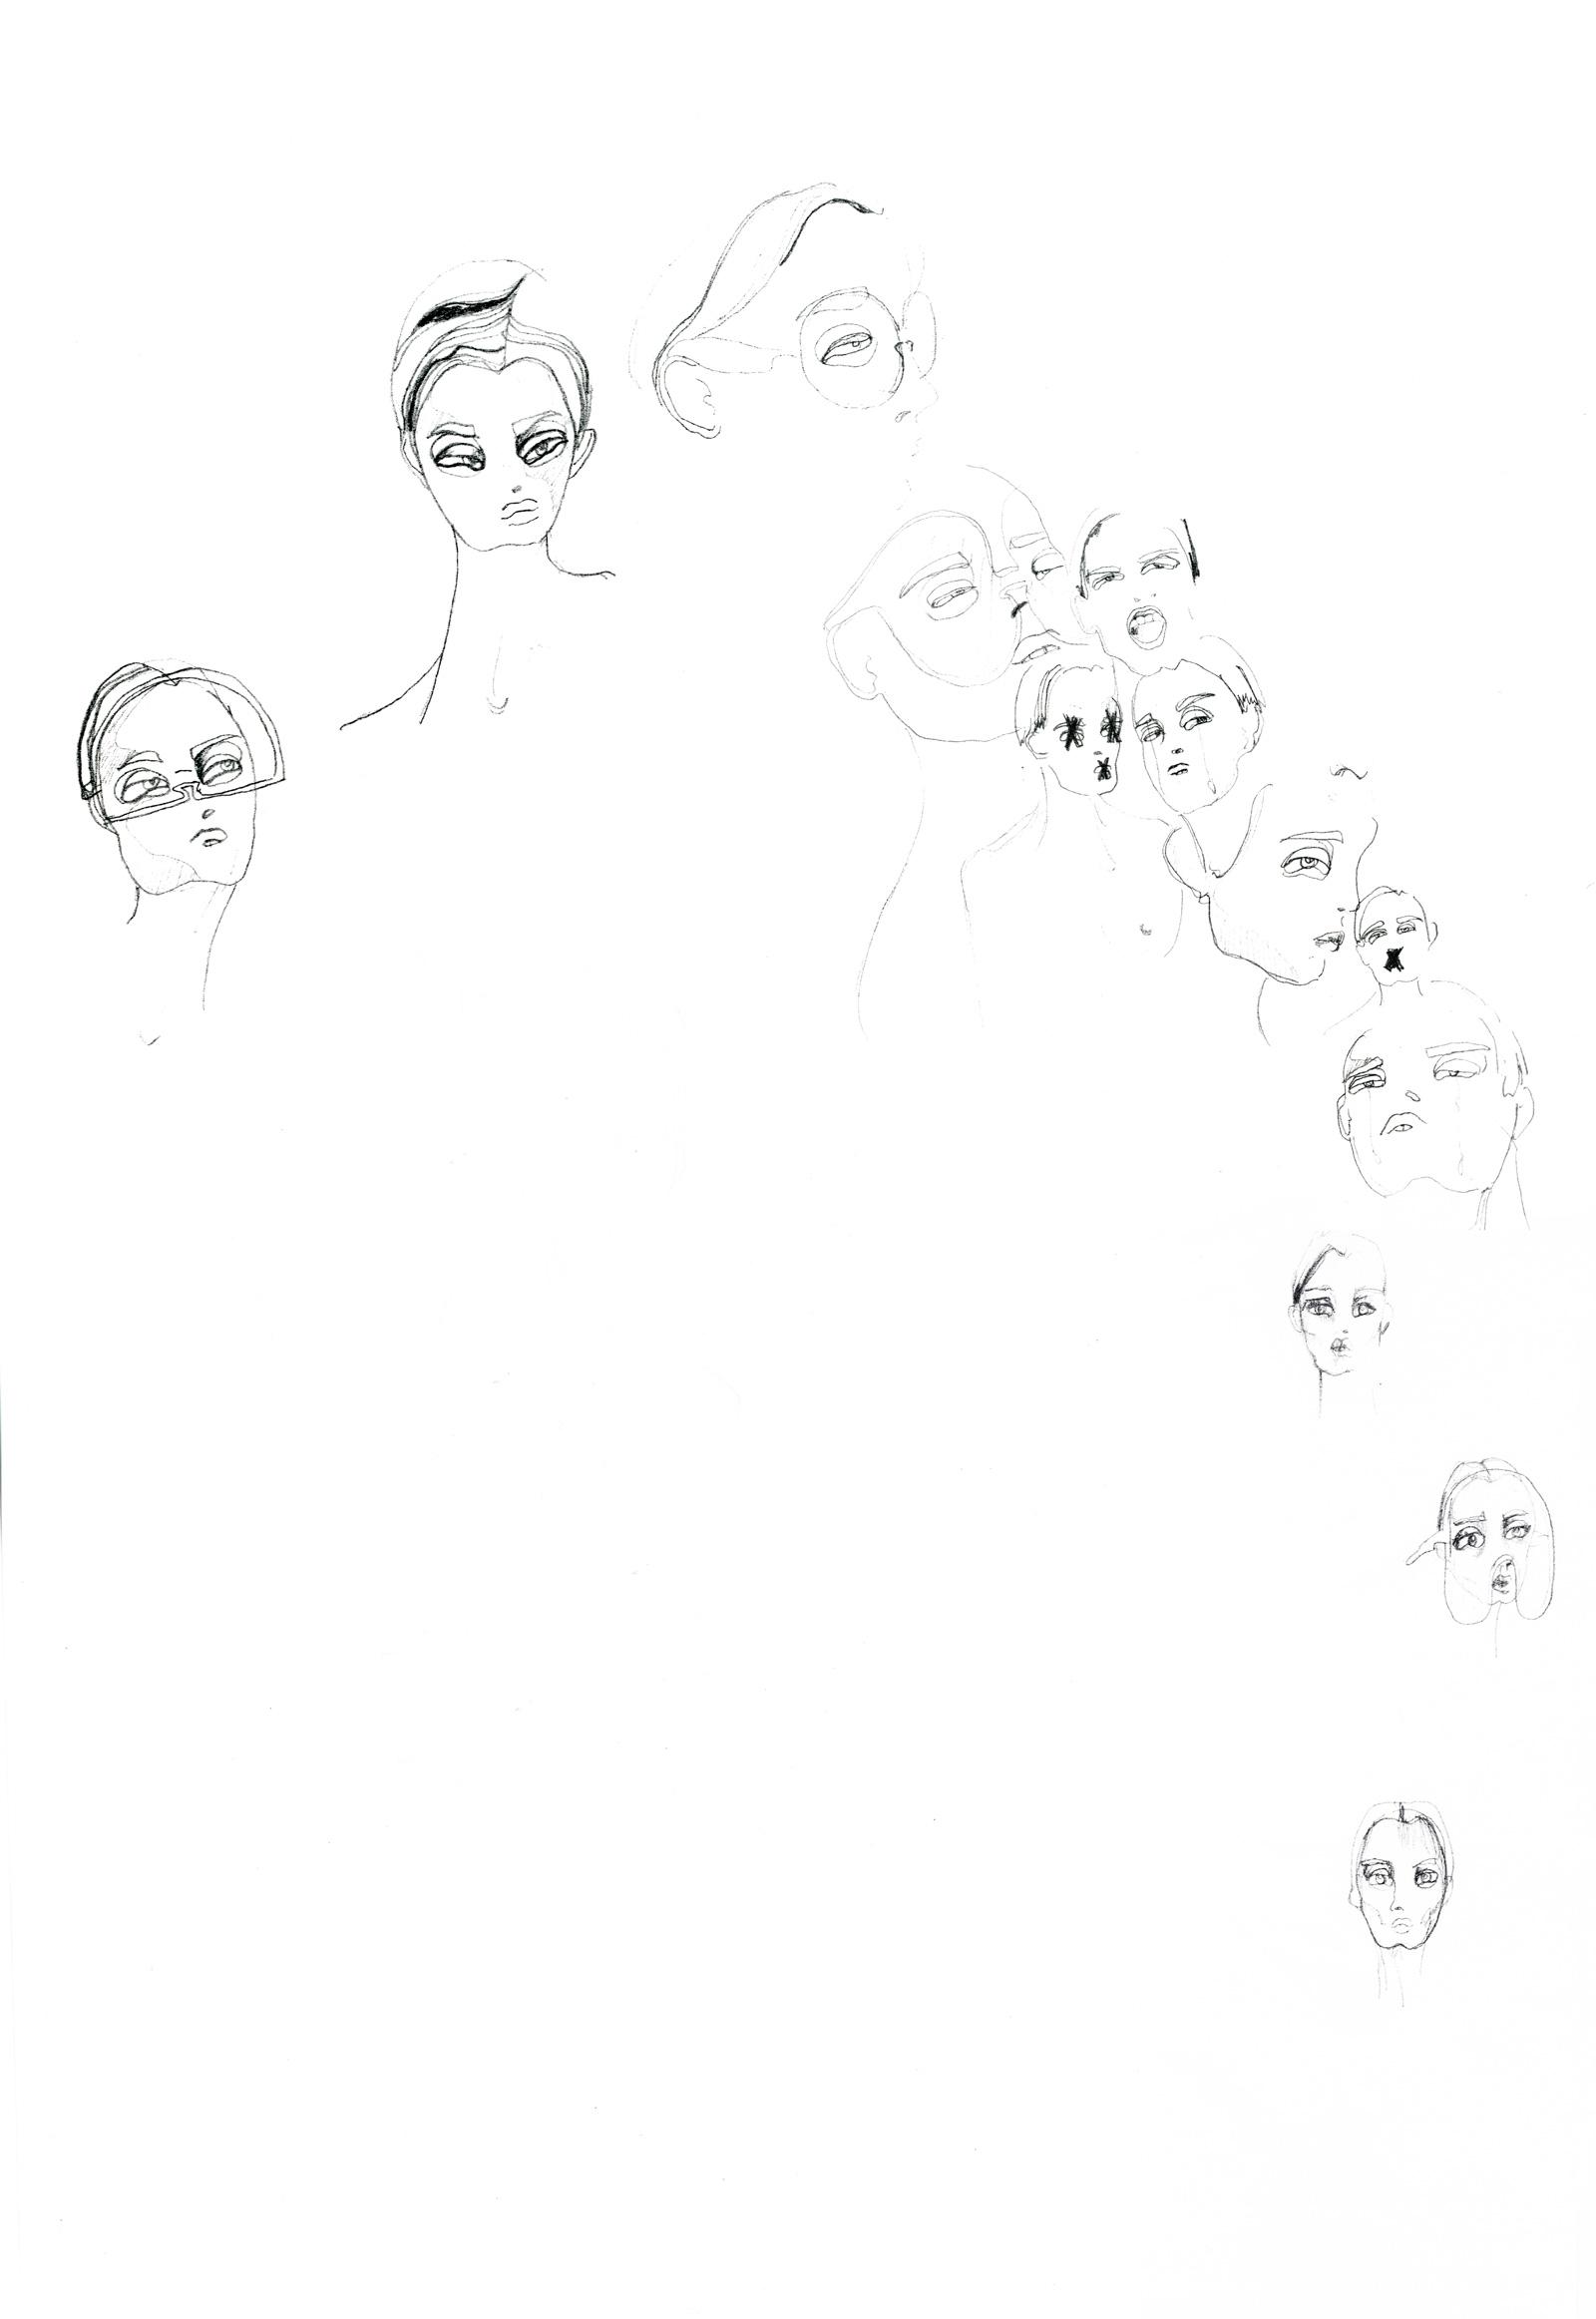 fine line pen on paper face and visors illustration